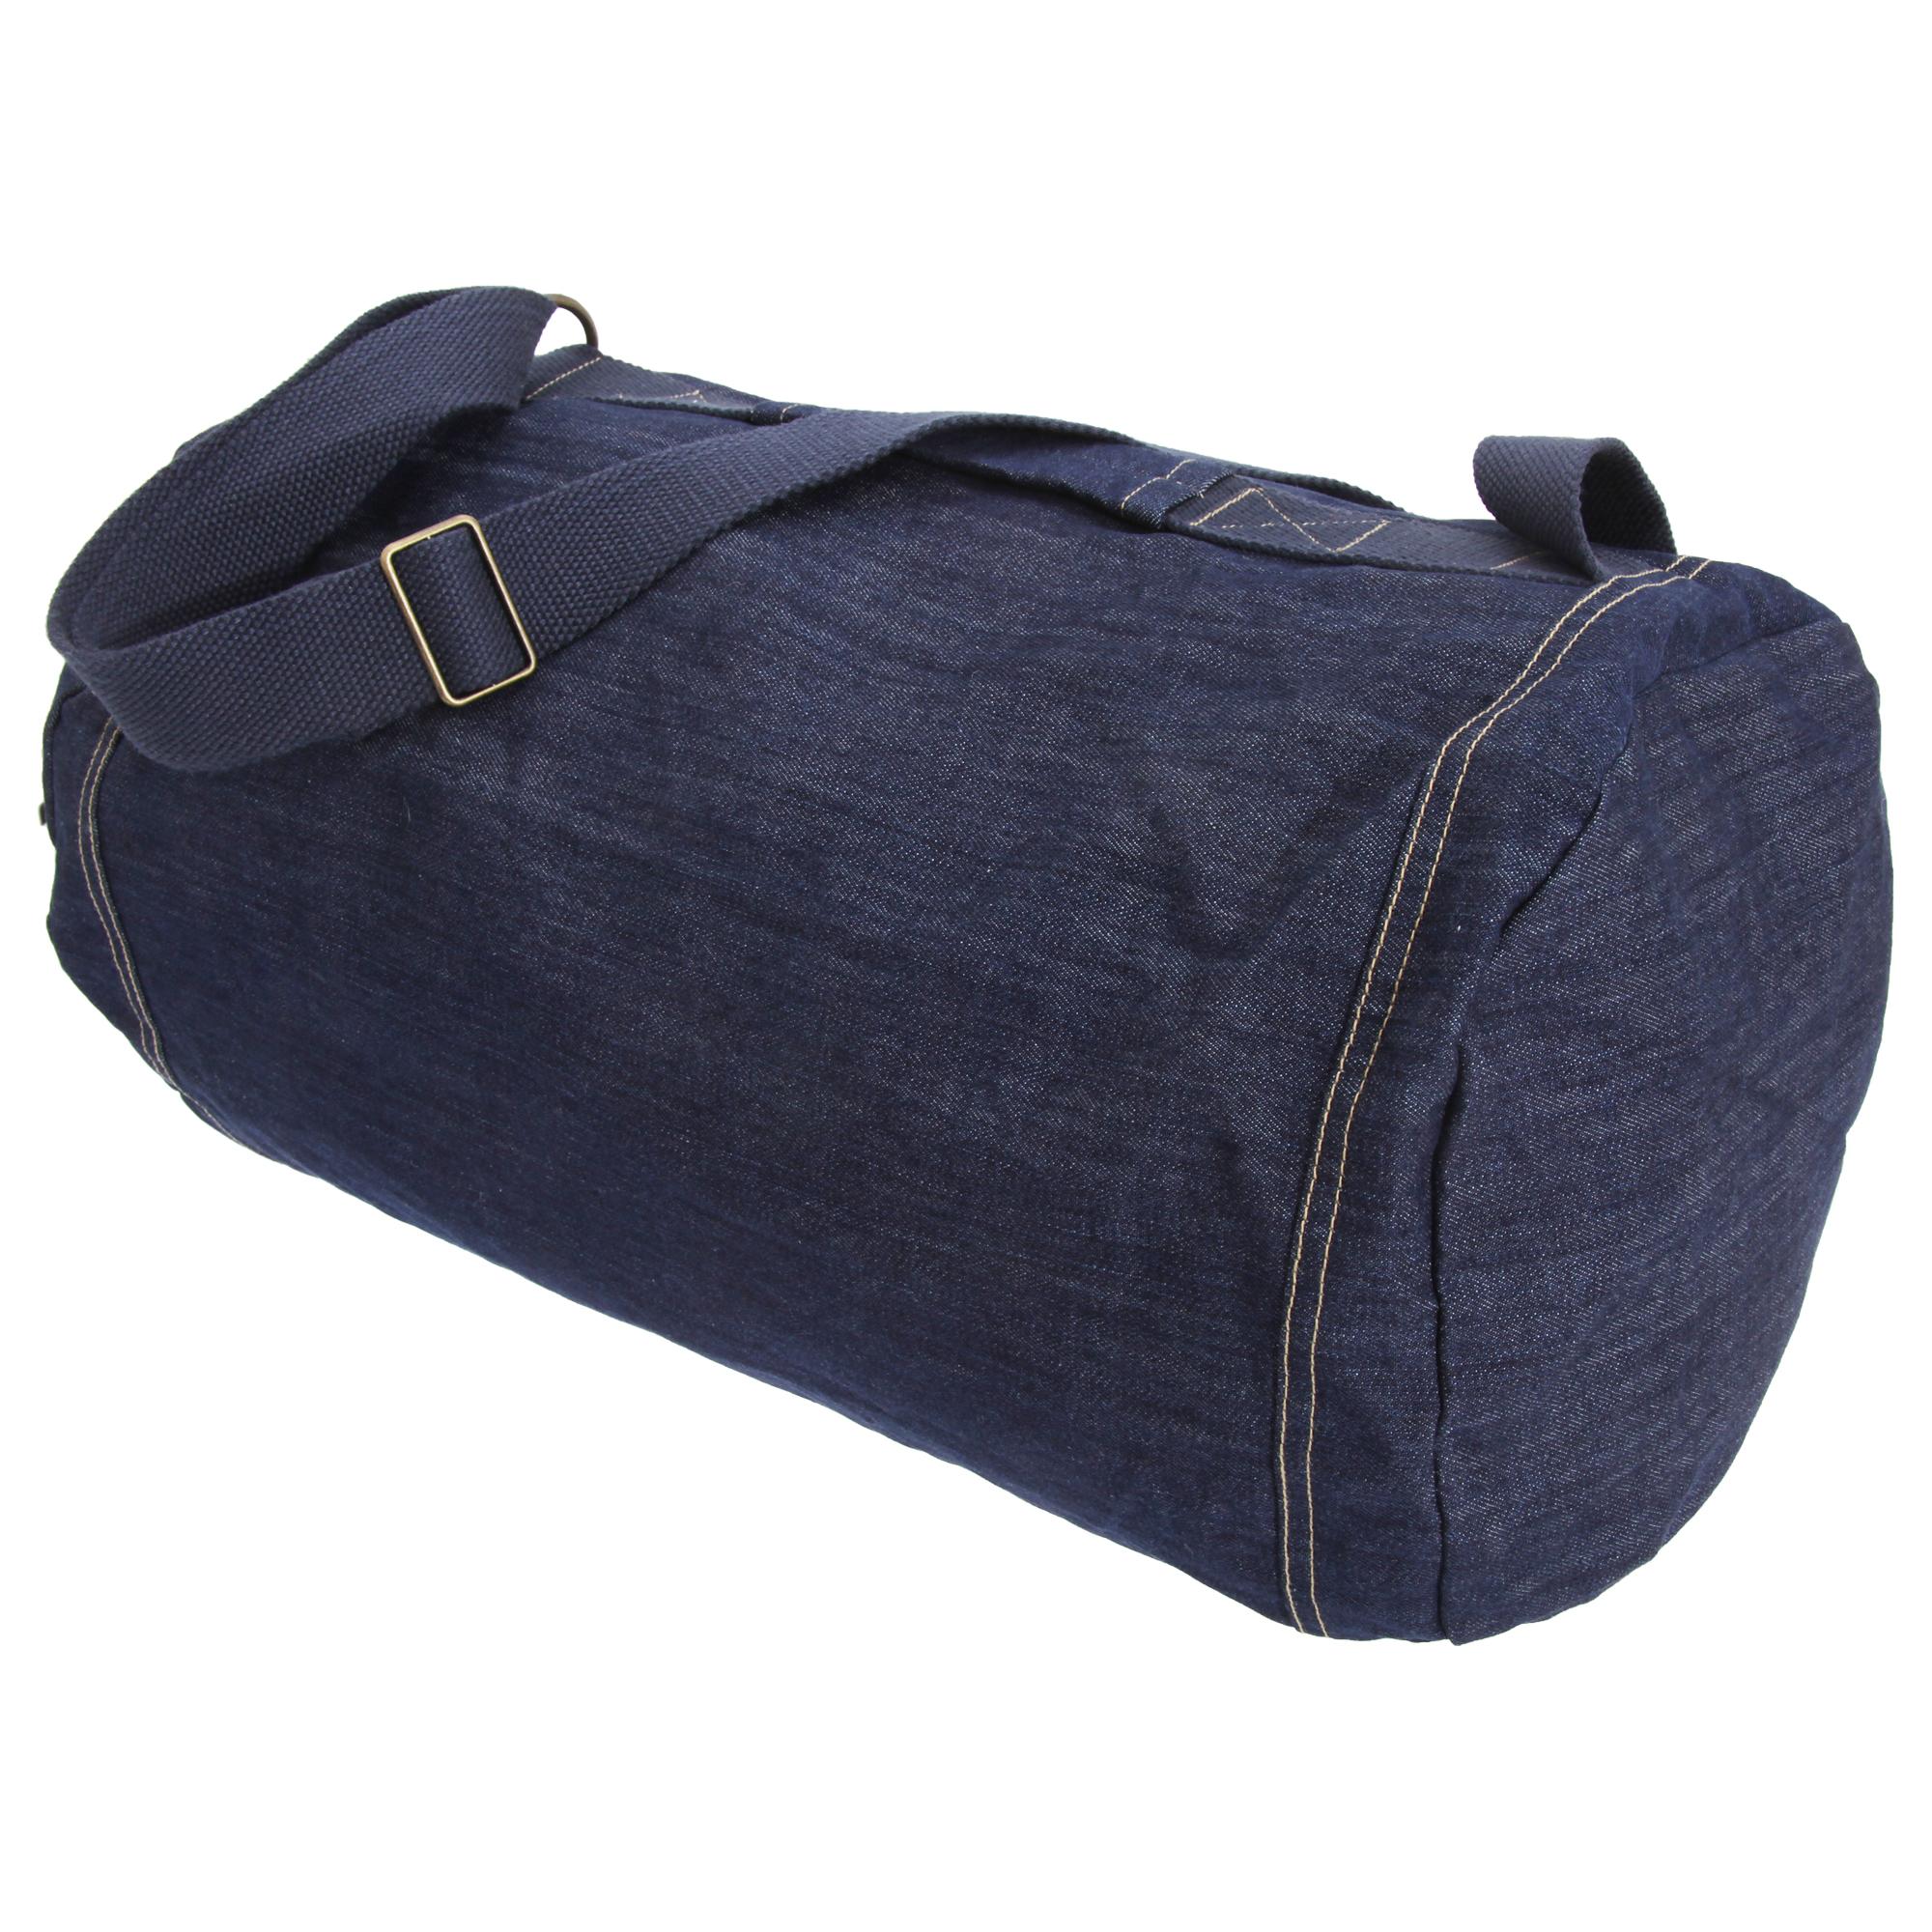 B&C Denim Feeling Good Holdall Duffle Bag (One Size) (Deep Blue Denim)